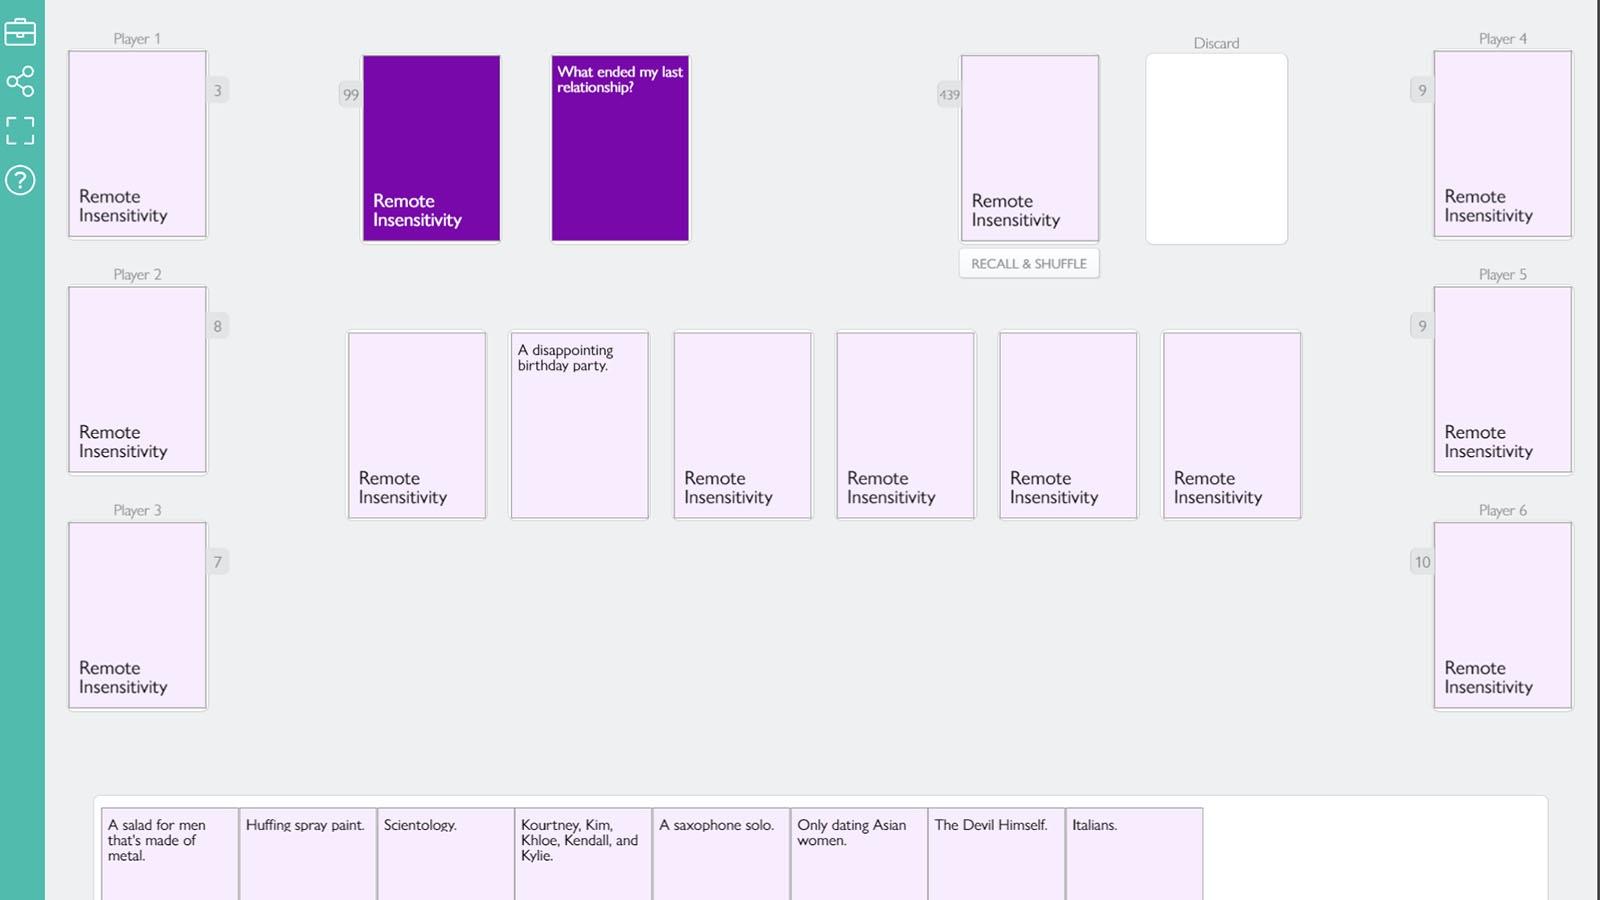 Screenshot of Remote Insensitivity game